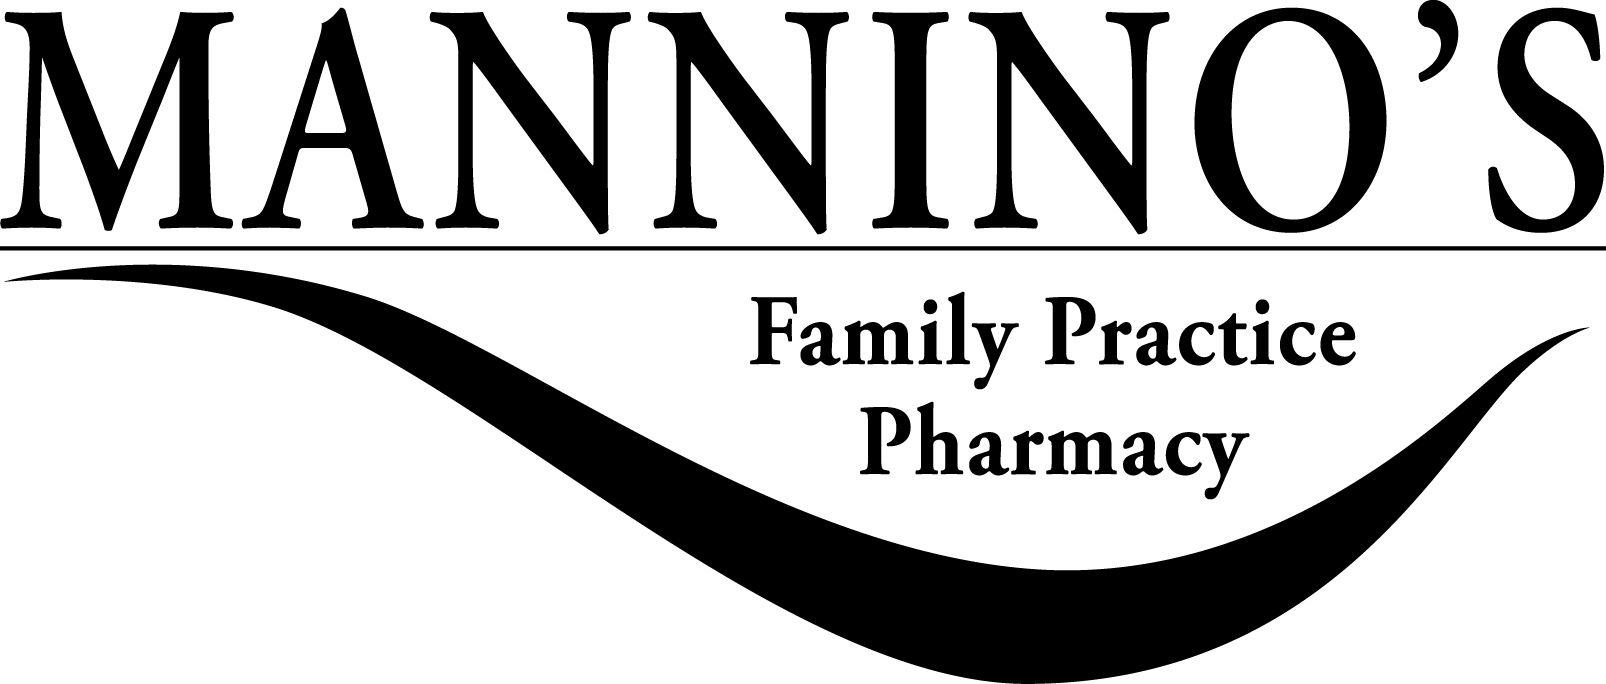 Mannino's Family Practice Pharmacy